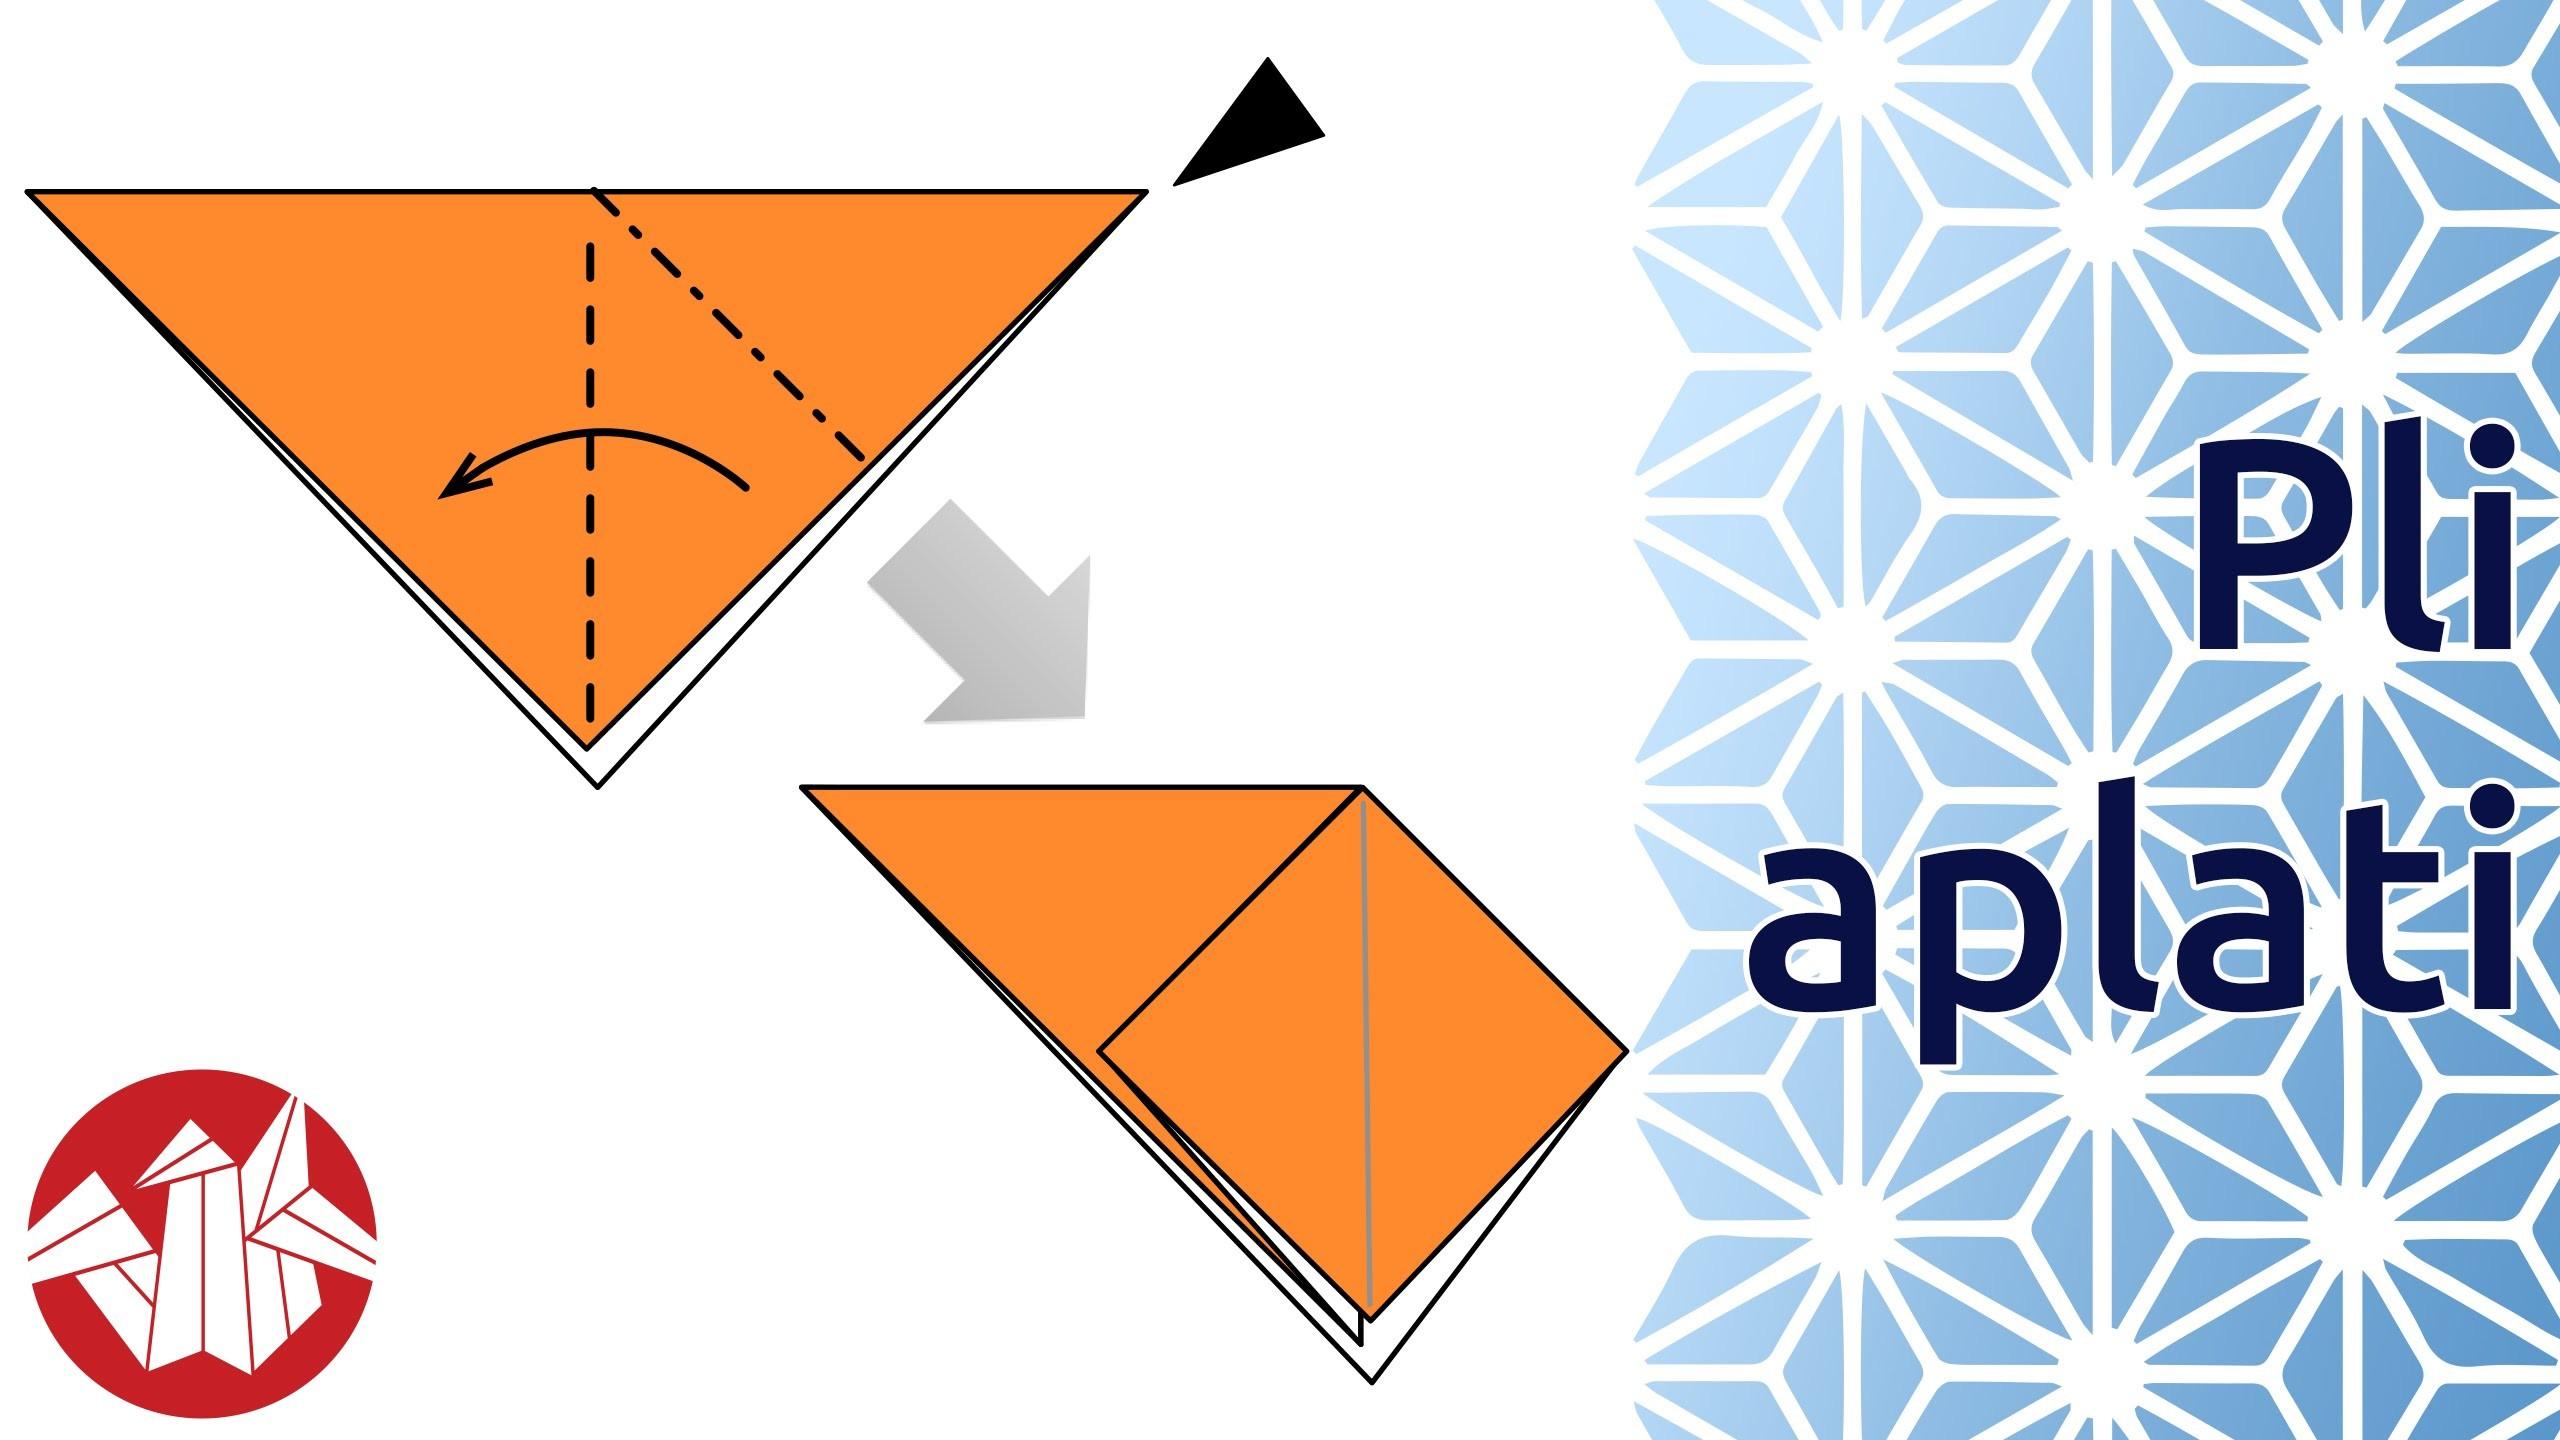 Débuter en Origami - Réaliser un pli aplati (Squash Fold) [Senbazuru]